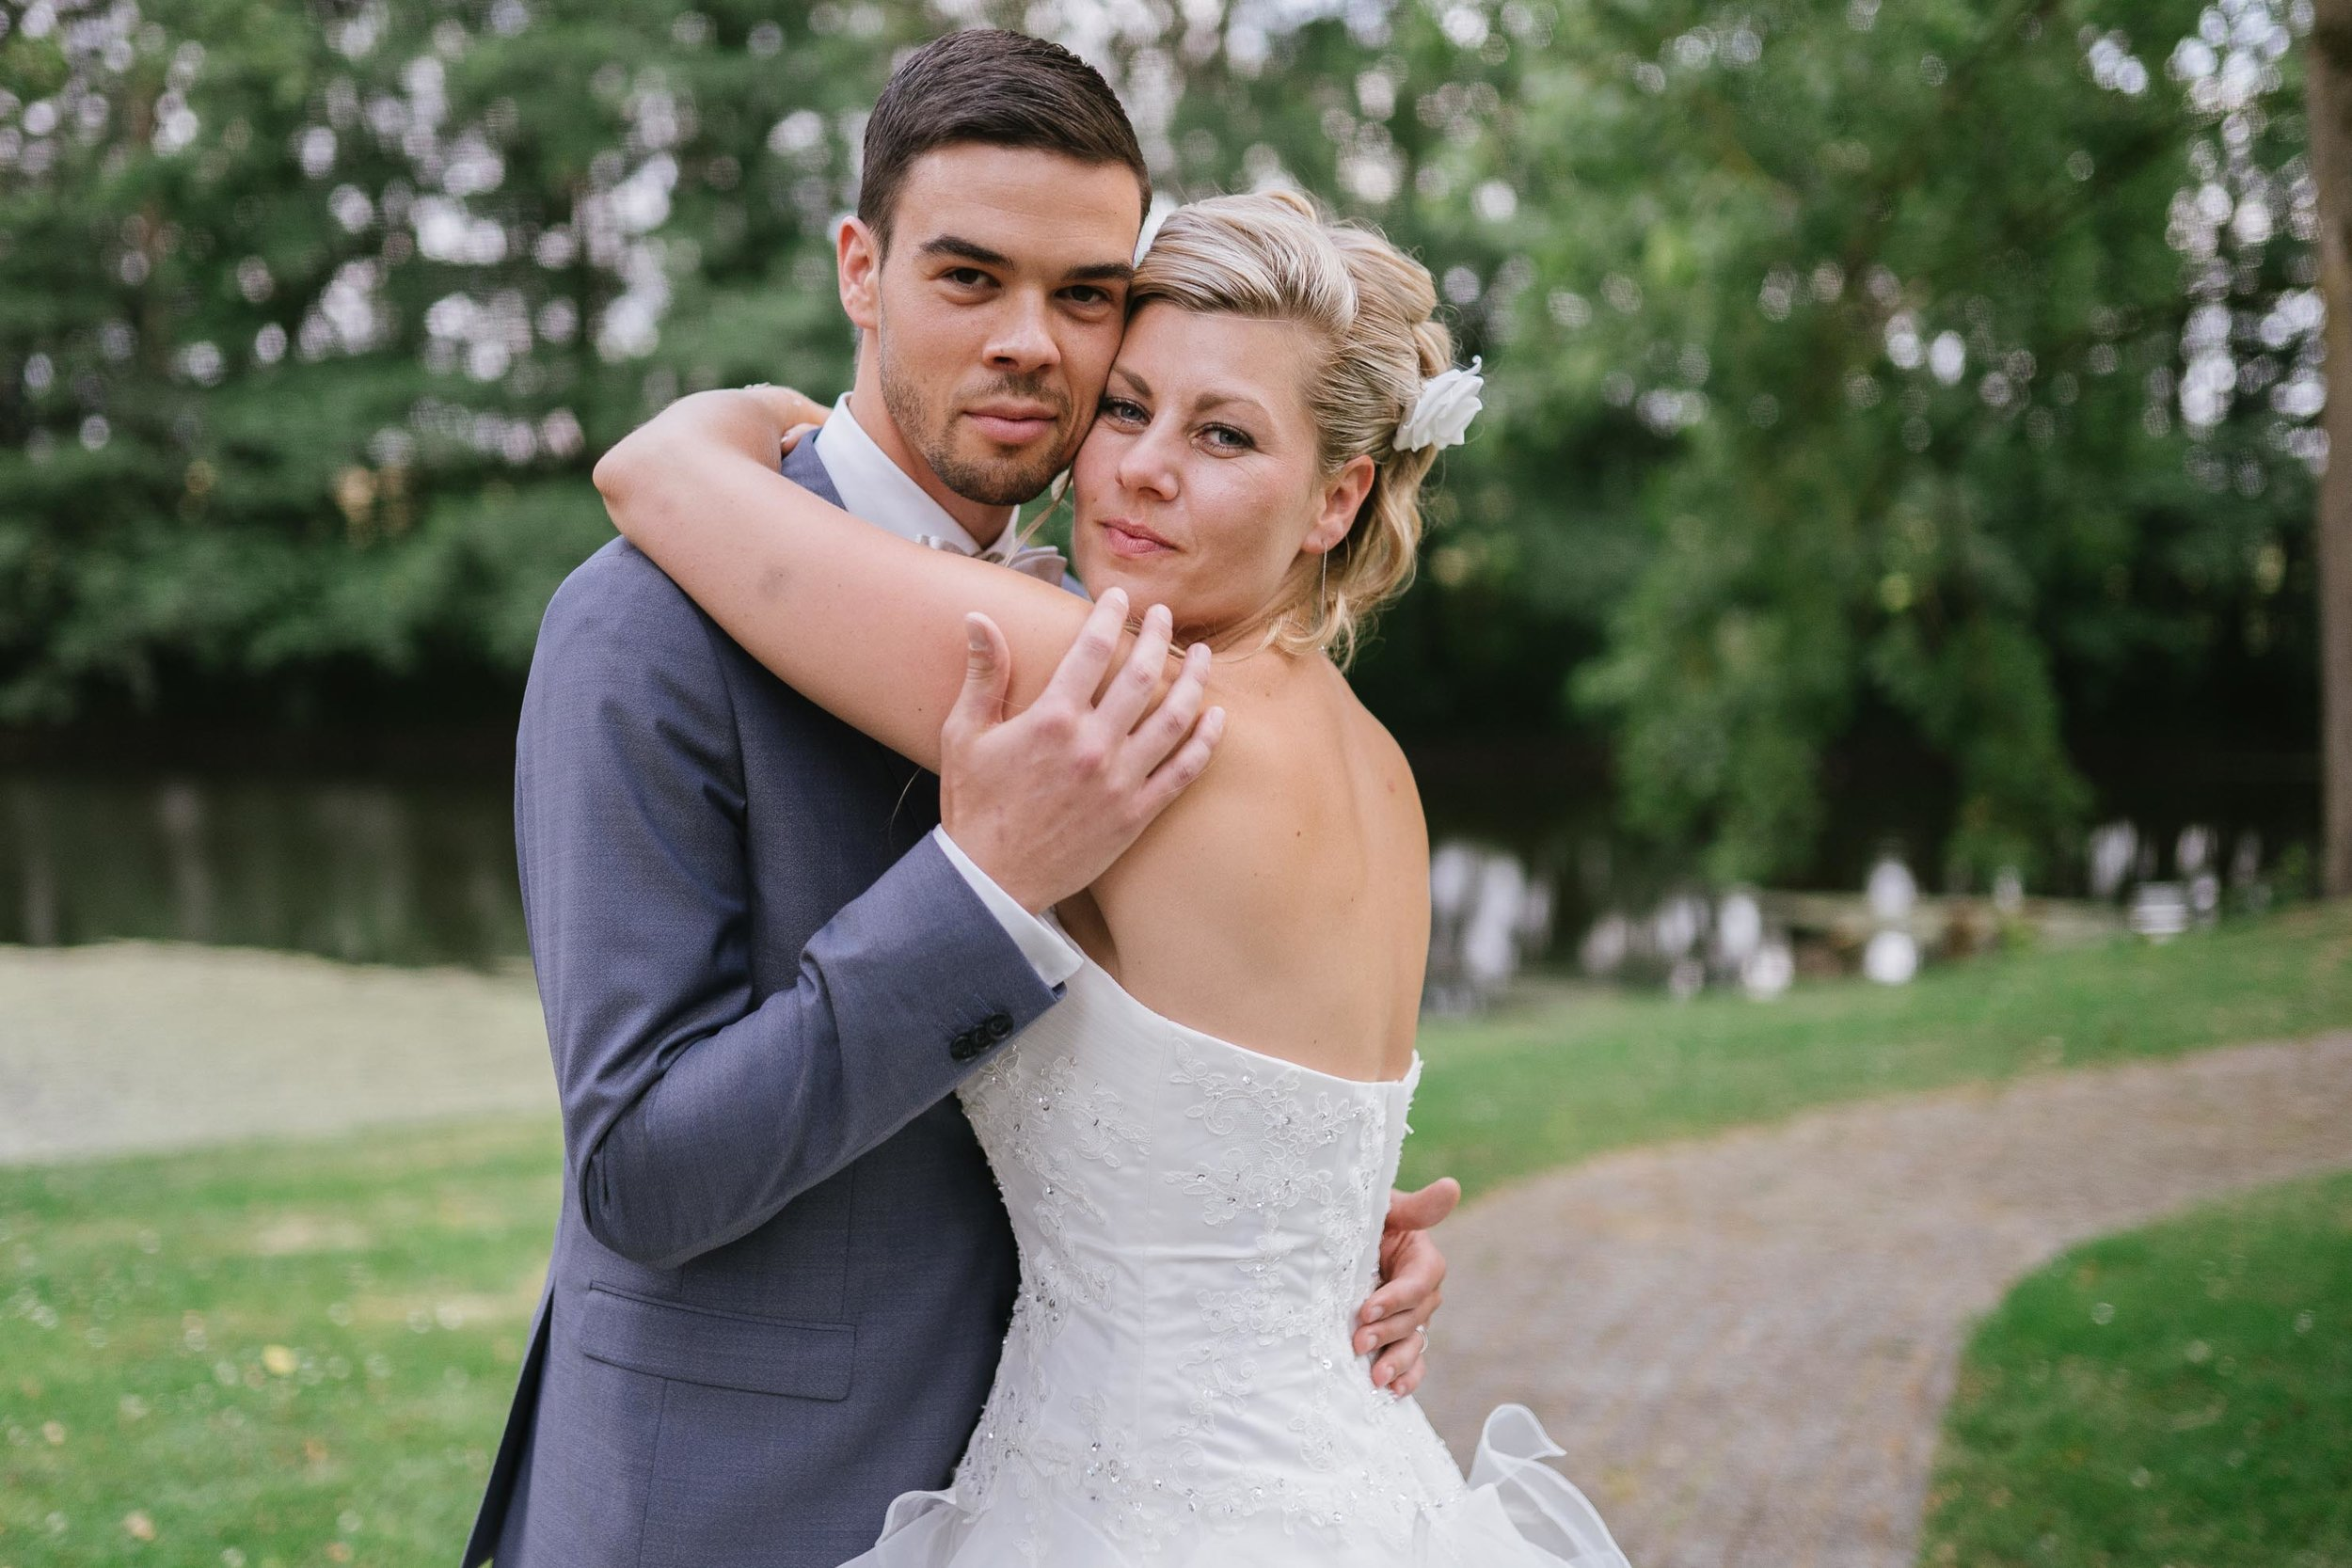 photographe-videaste-bruxelles-mariage-reportage-leleu-19.jpg